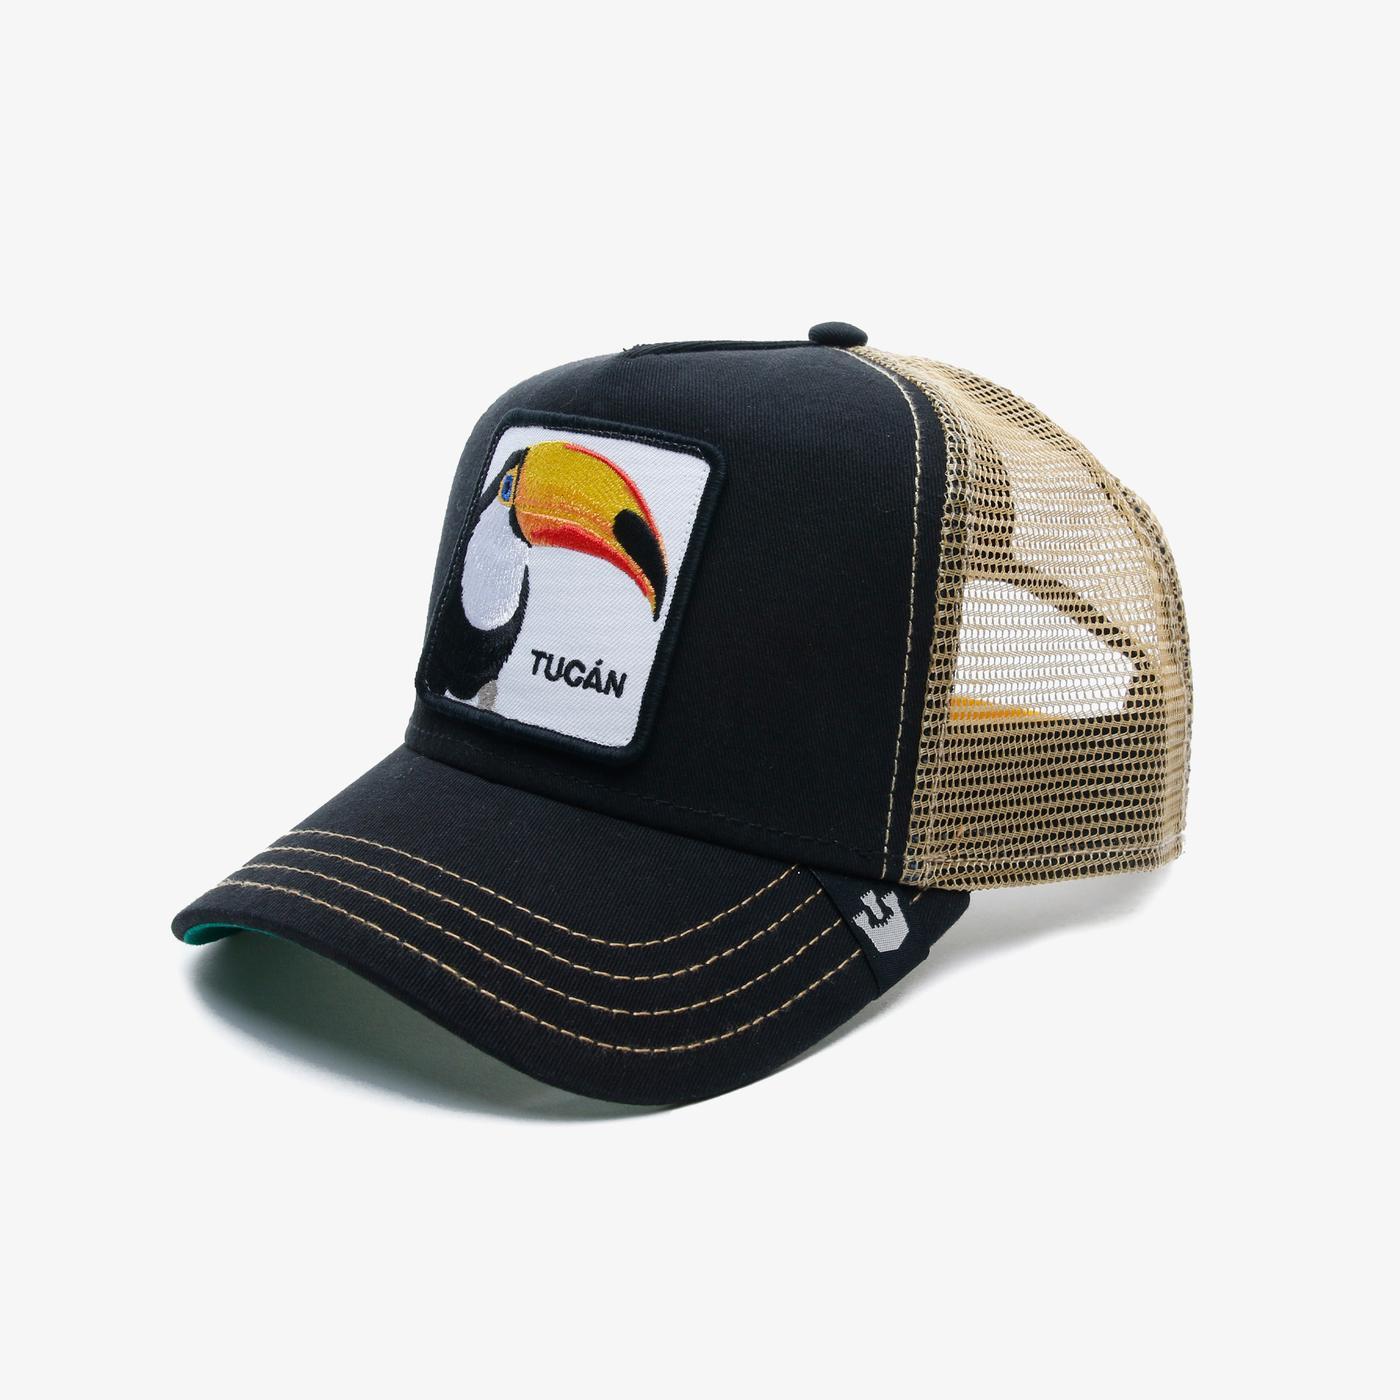 Goorin Bros Tucan Unisex Siyah Şapka